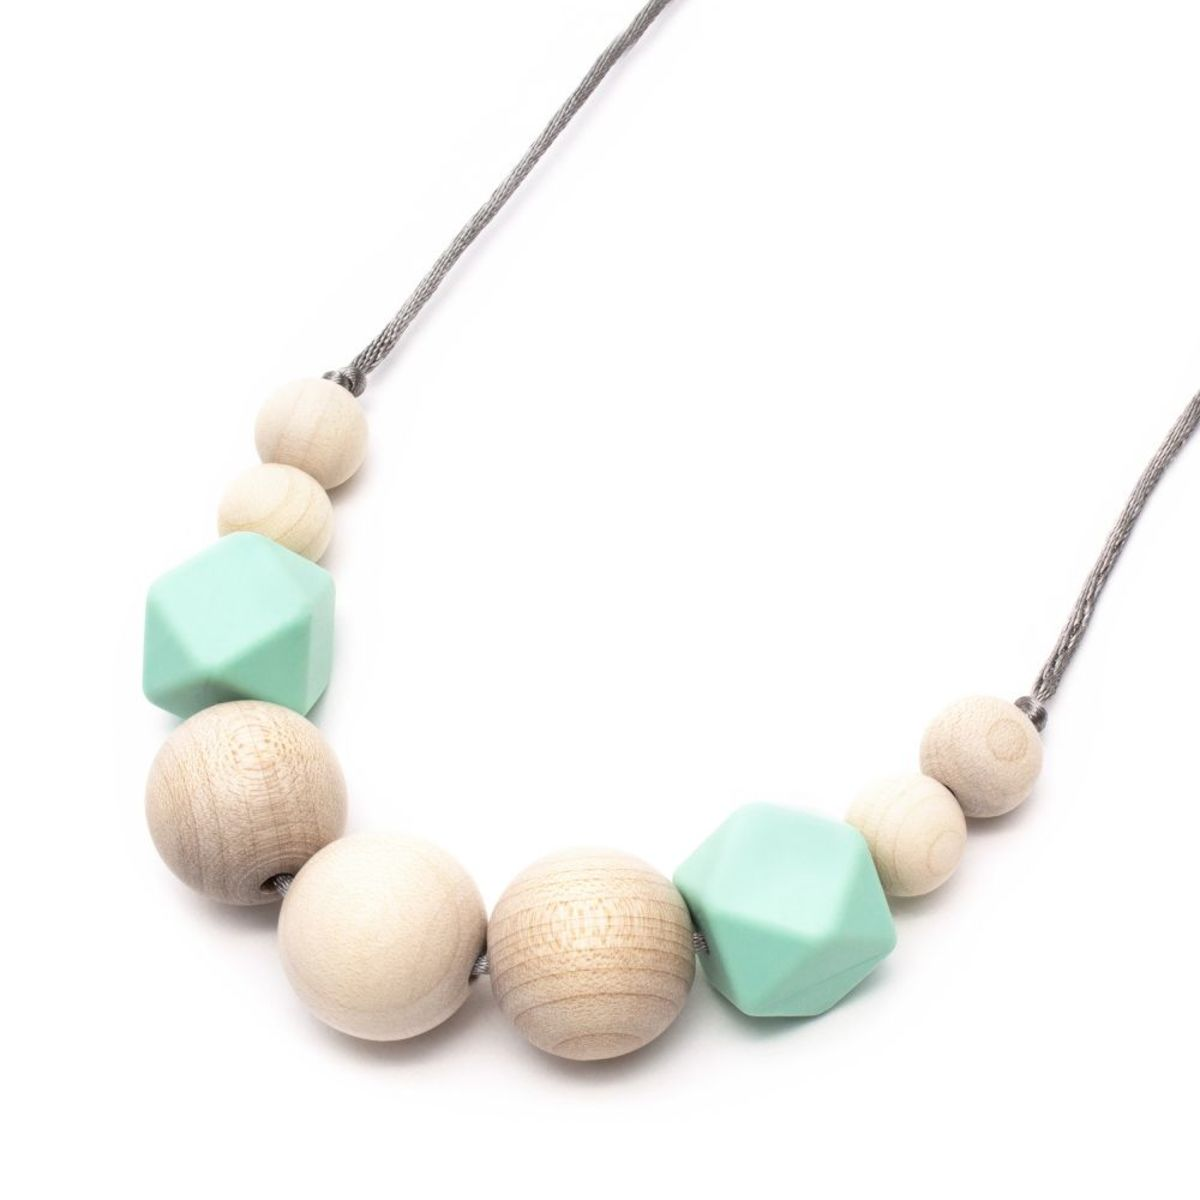 Silikónové dojčiace korále Olivia Silicone necklace